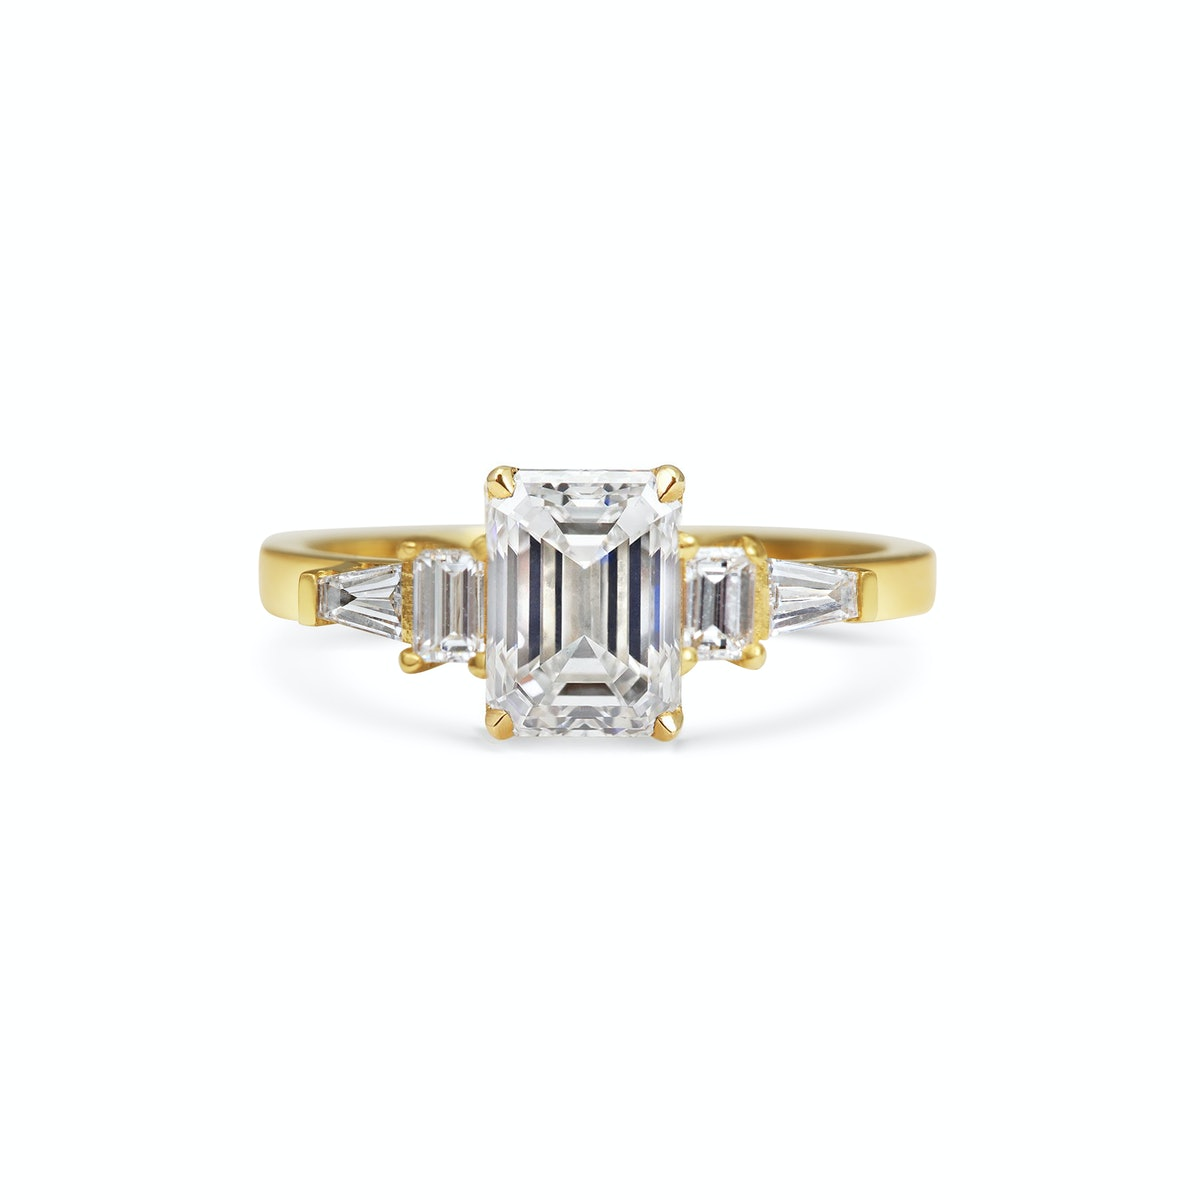 Art Deco Baguette Diamond Ring